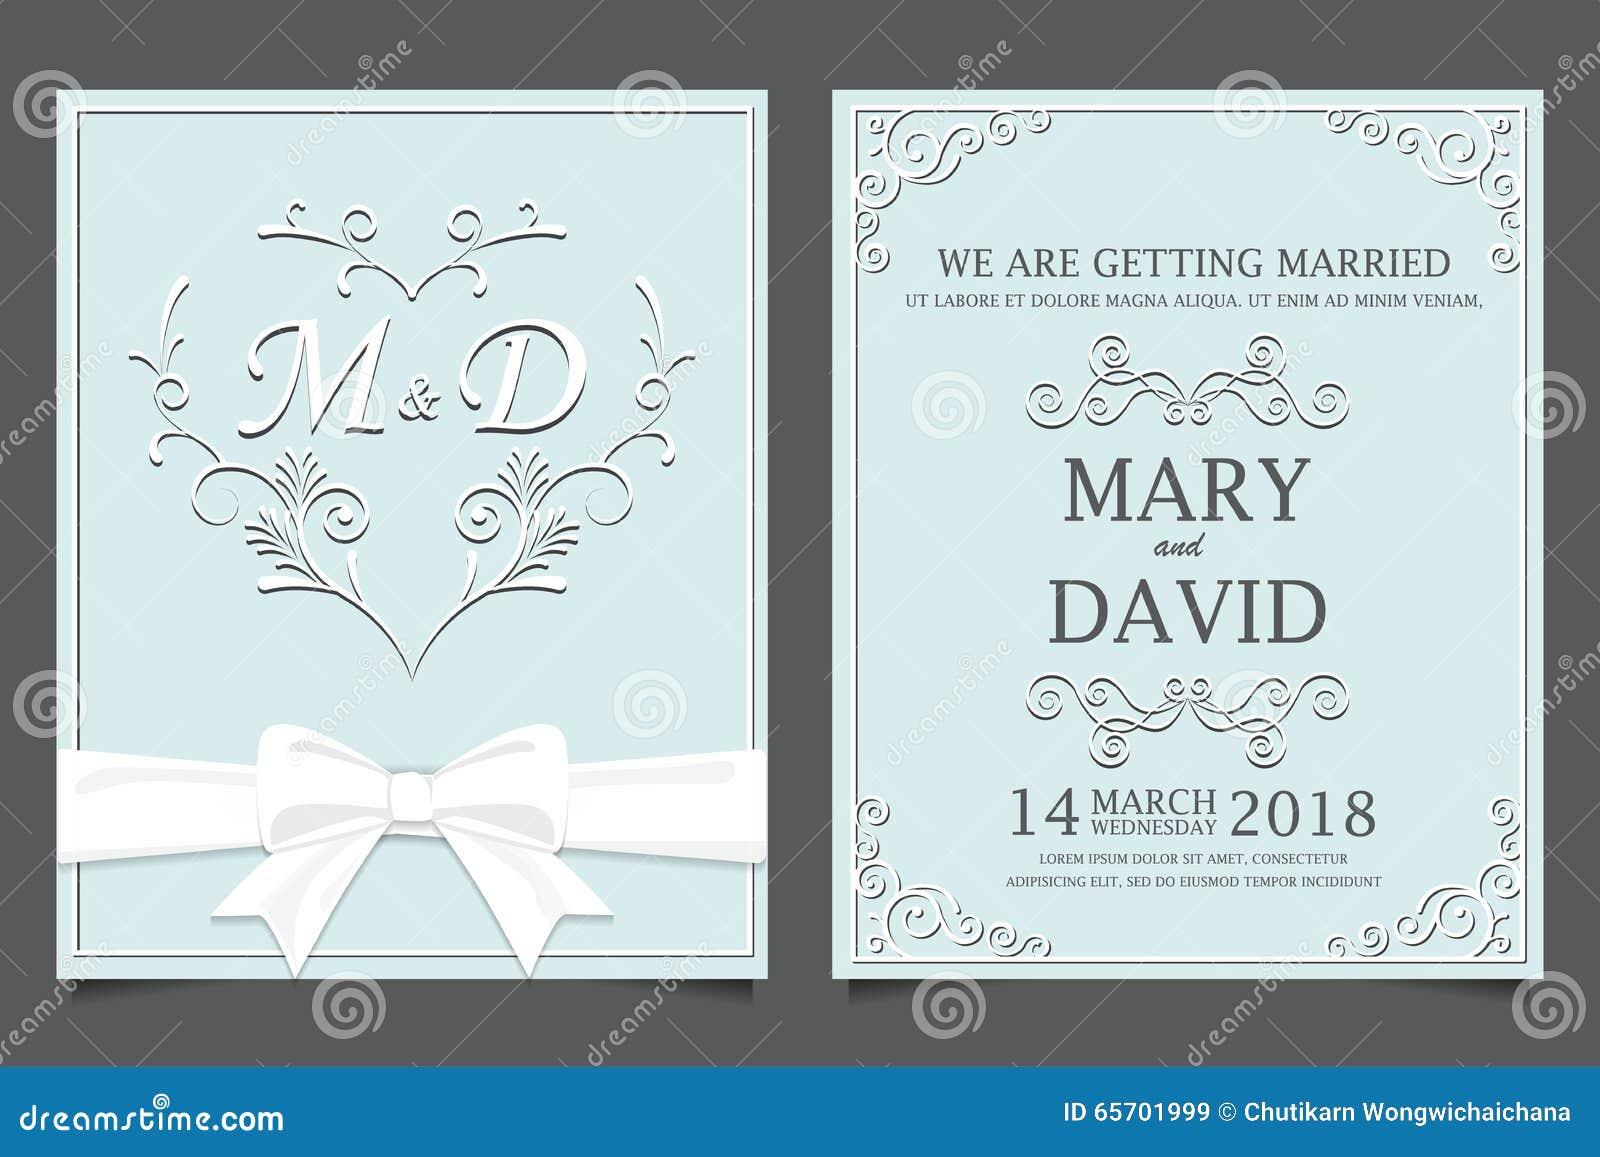 carte amour et valentines d 39 invitation de mariage. Black Bedroom Furniture Sets. Home Design Ideas